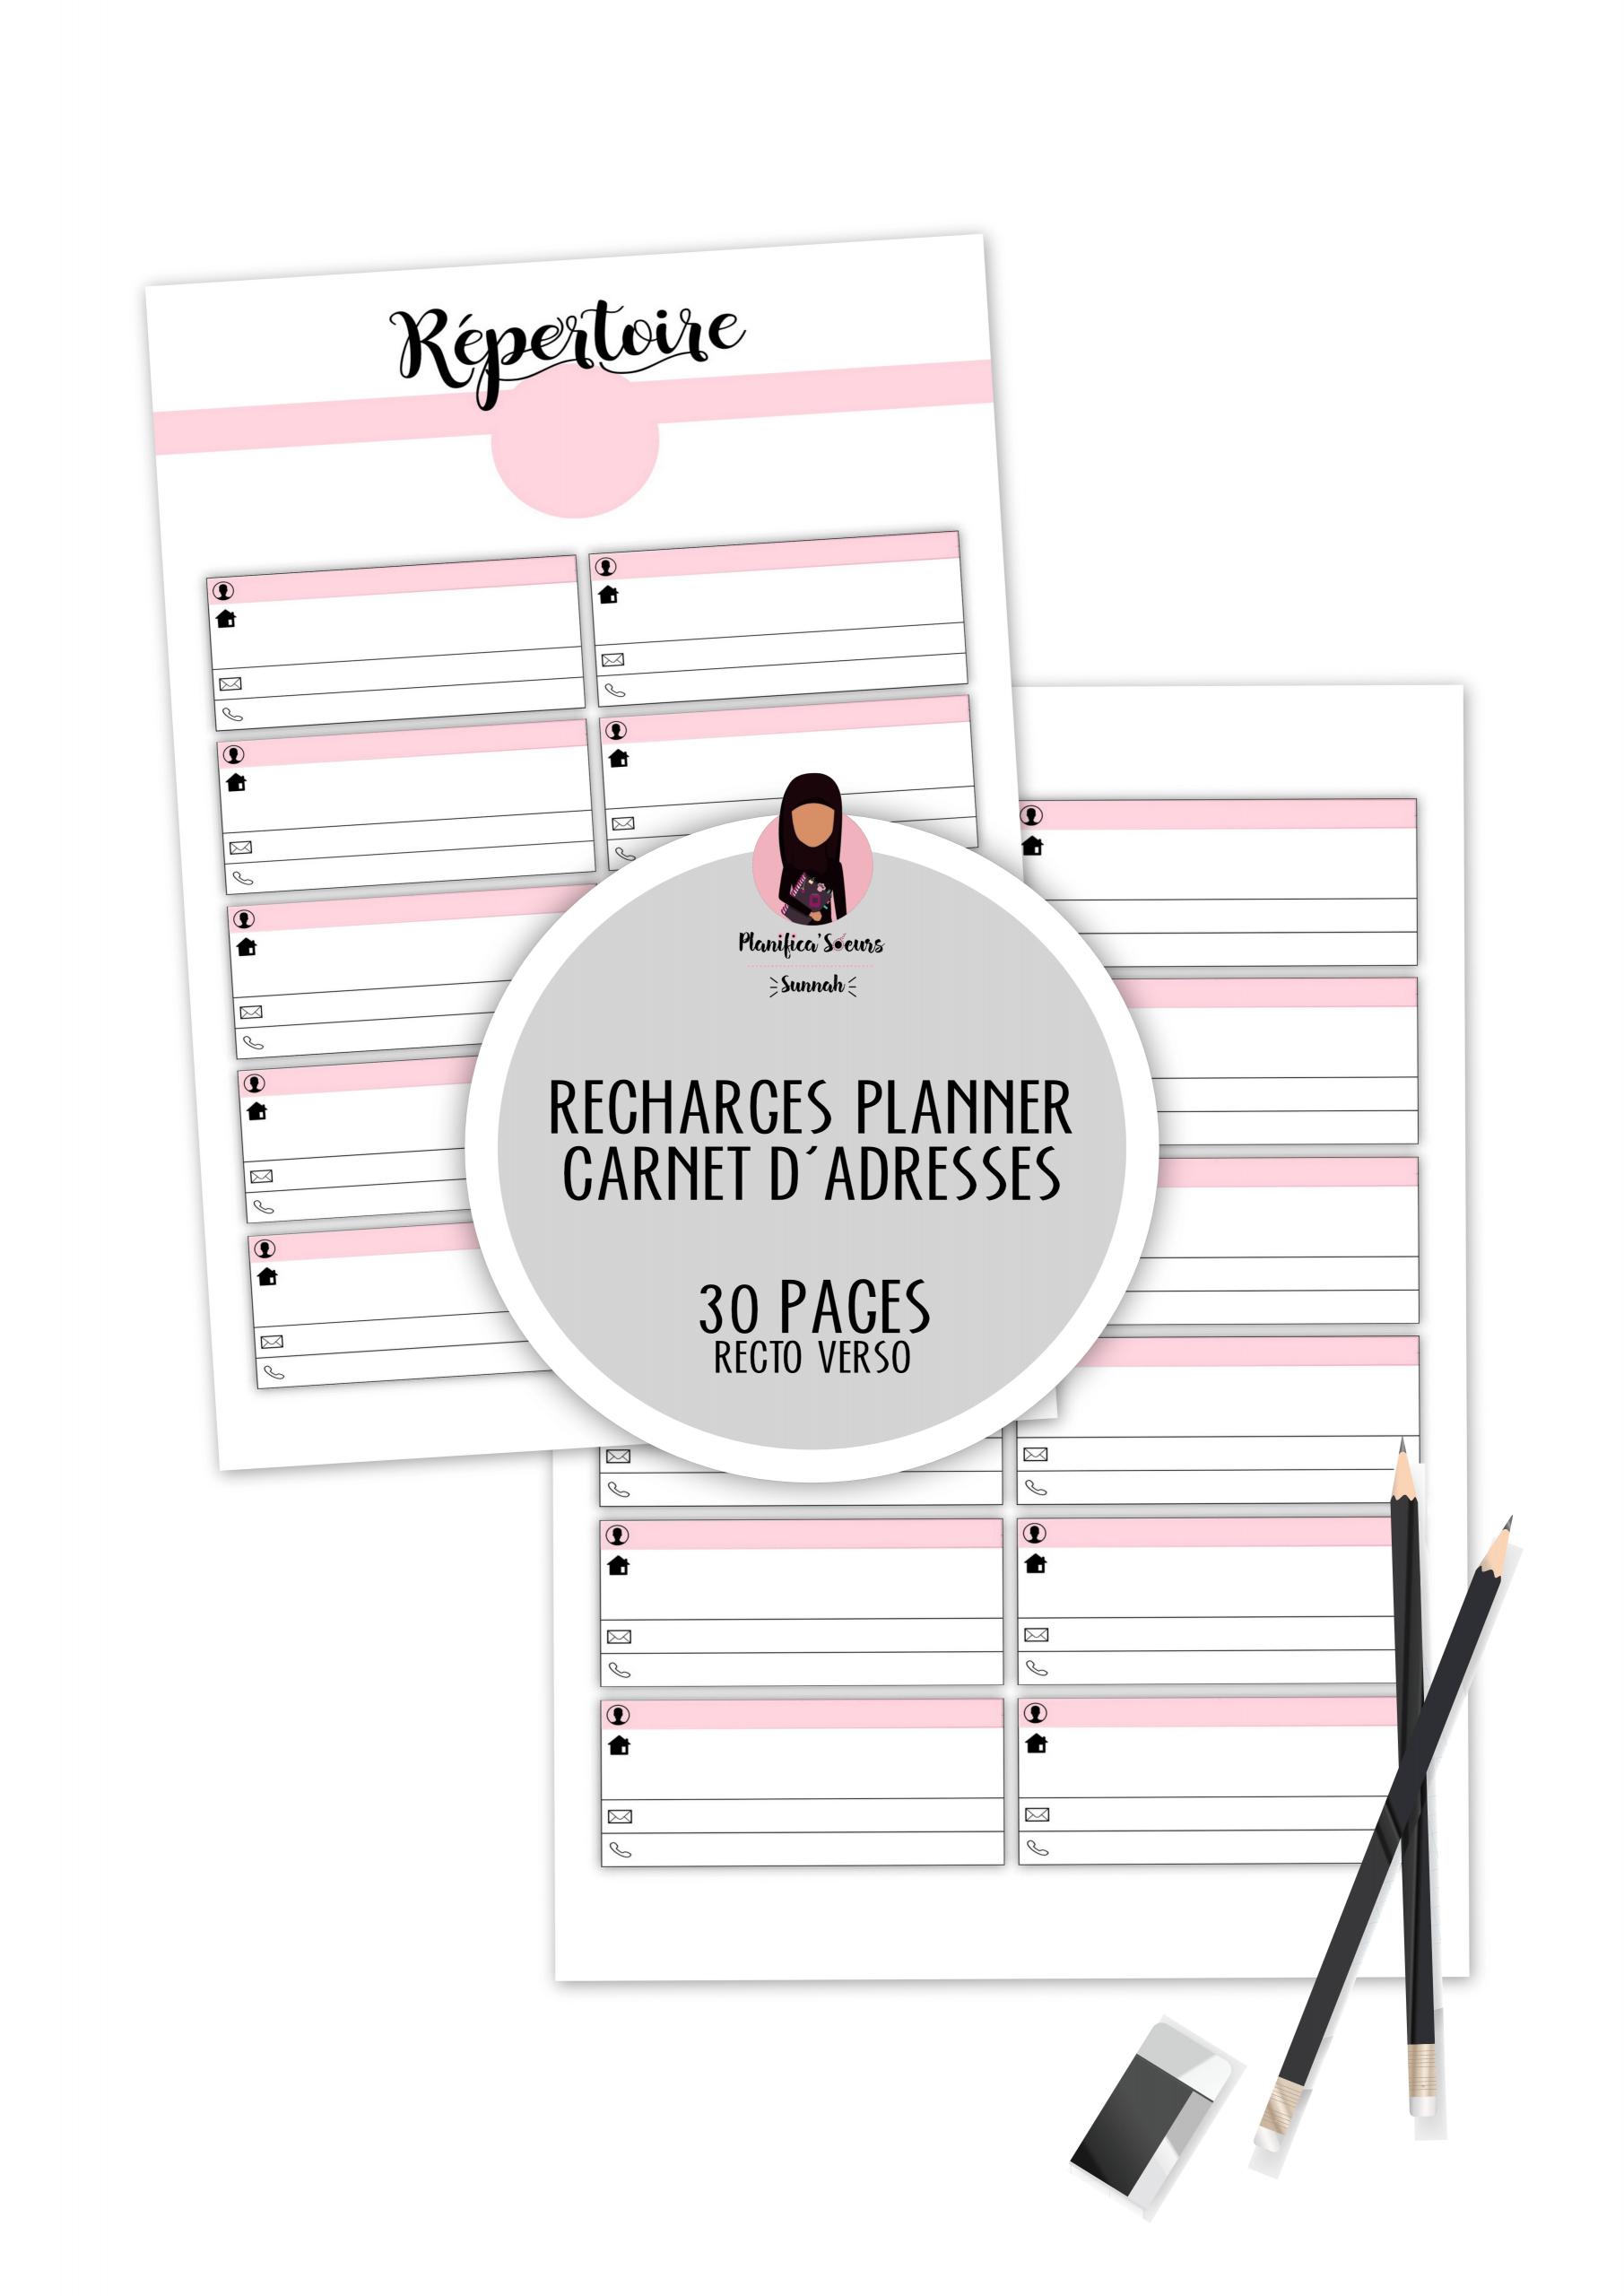 recharge planner carnet d'adresses repertoire